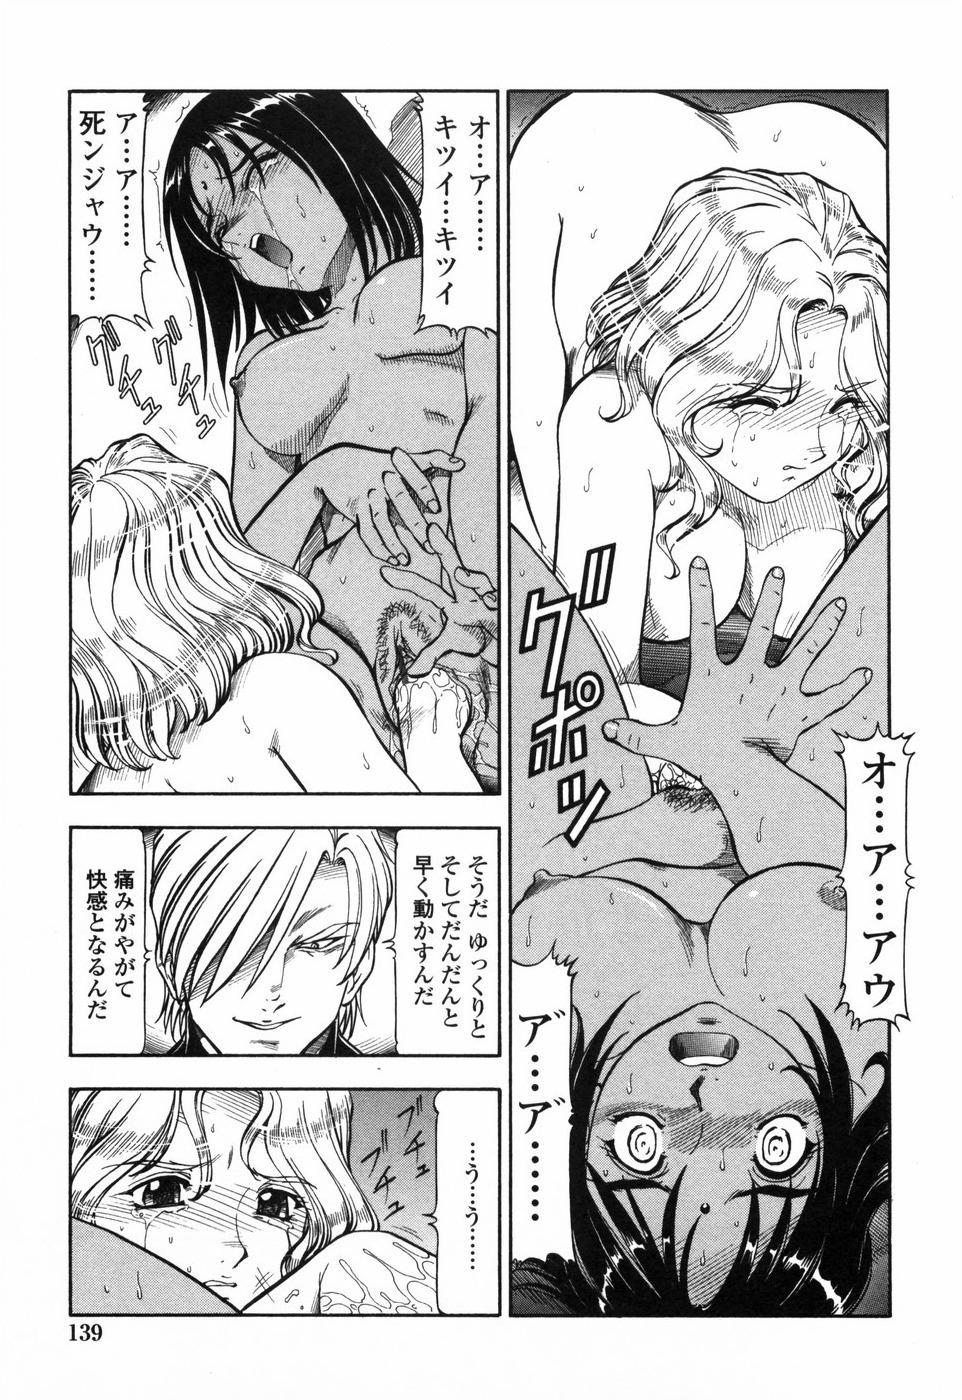 Kichiku Houteishiki - Equation of brutal person 145